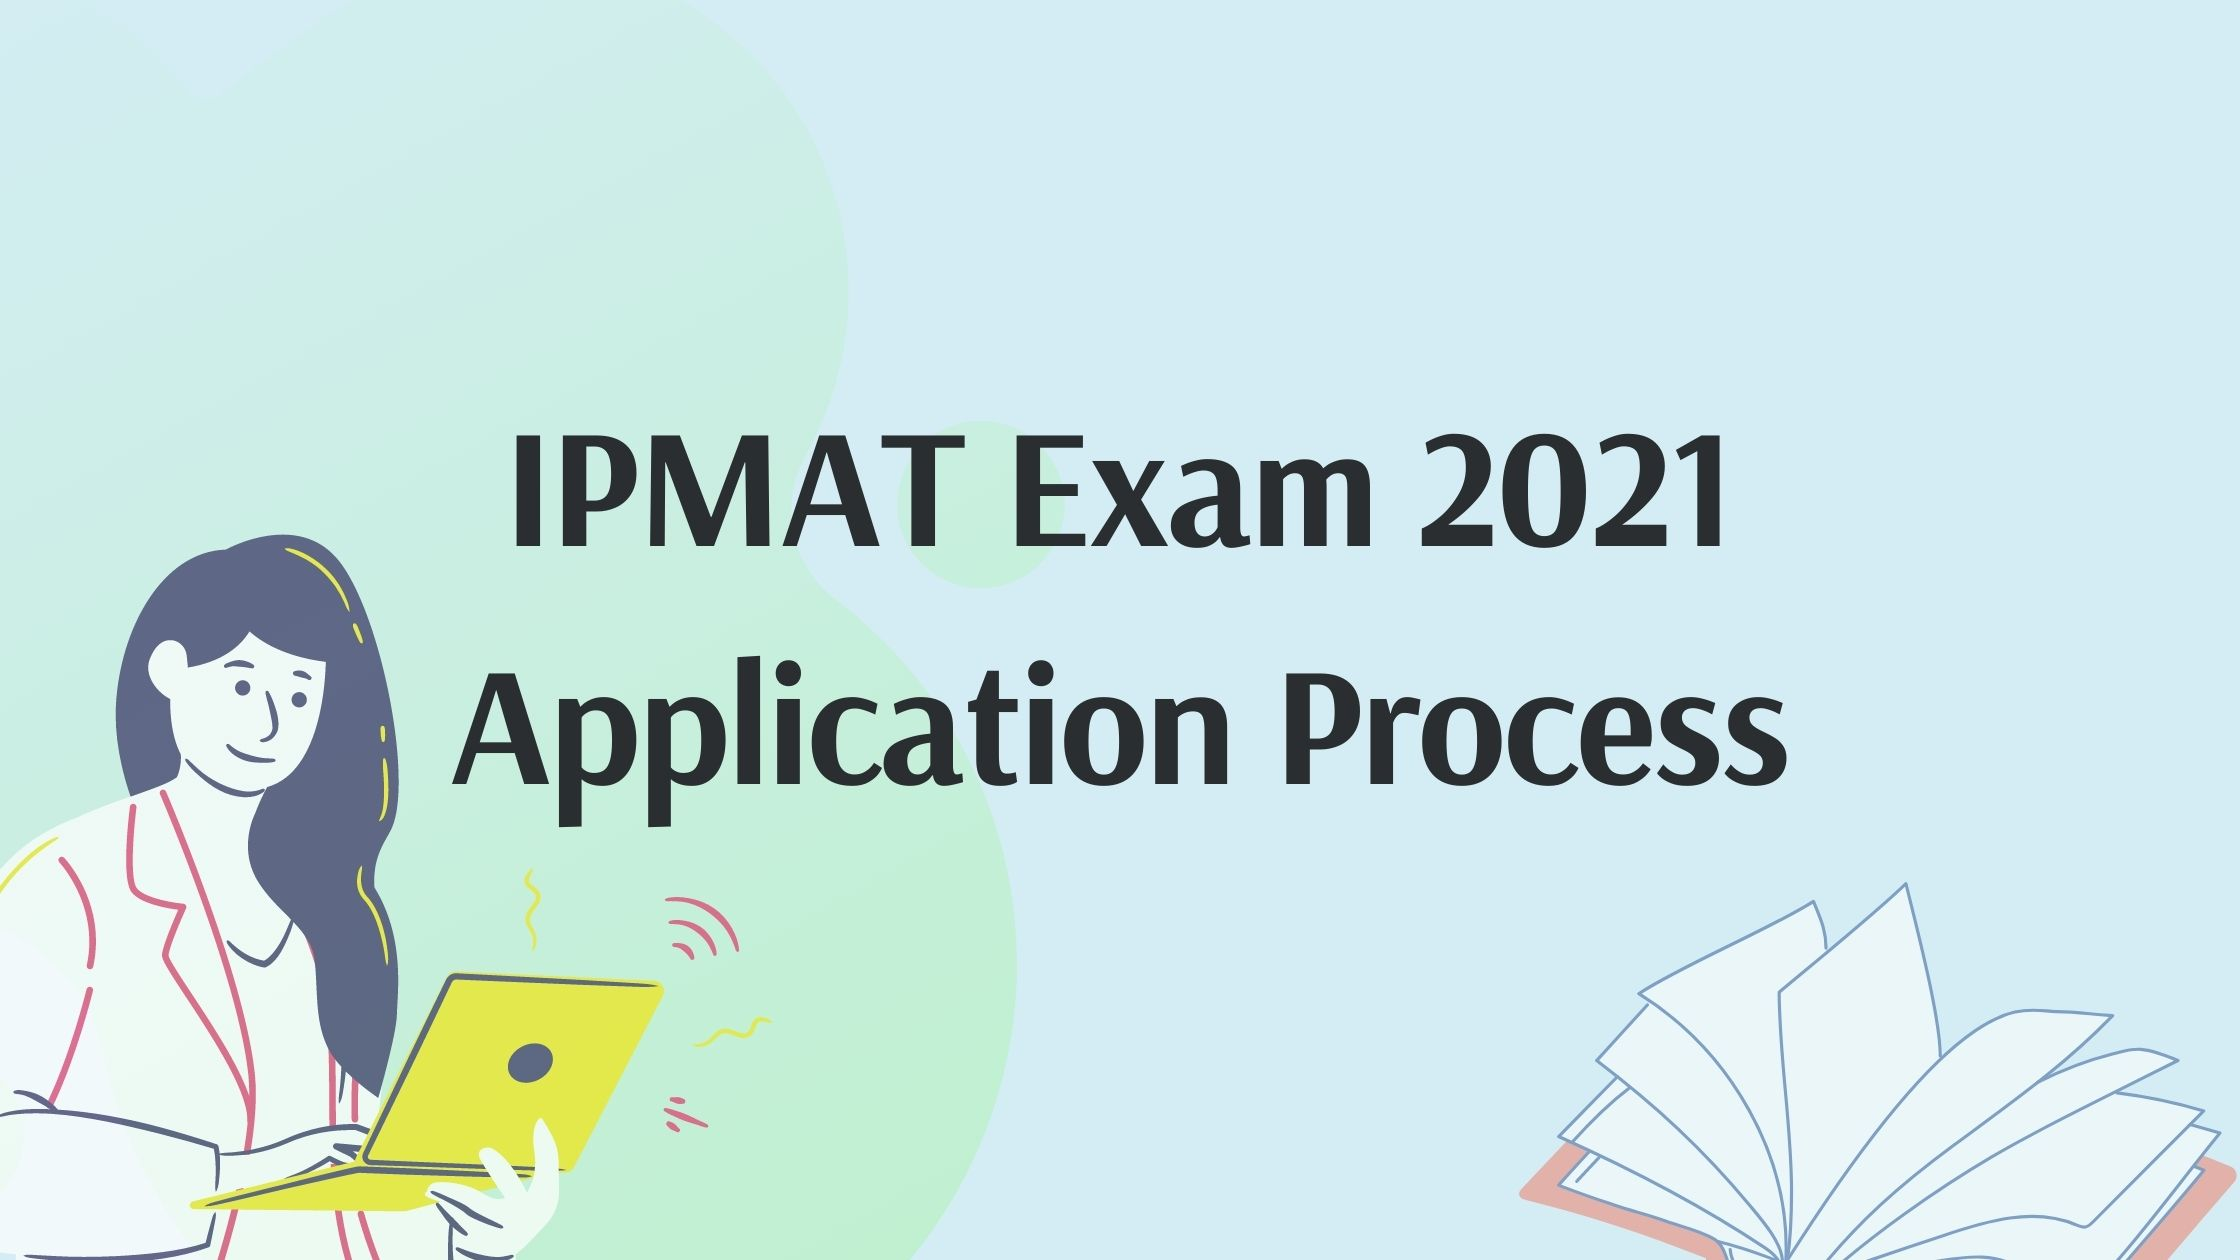 IPMAT Exam 2021: Application Form, Registration And IPMAT Admission Process